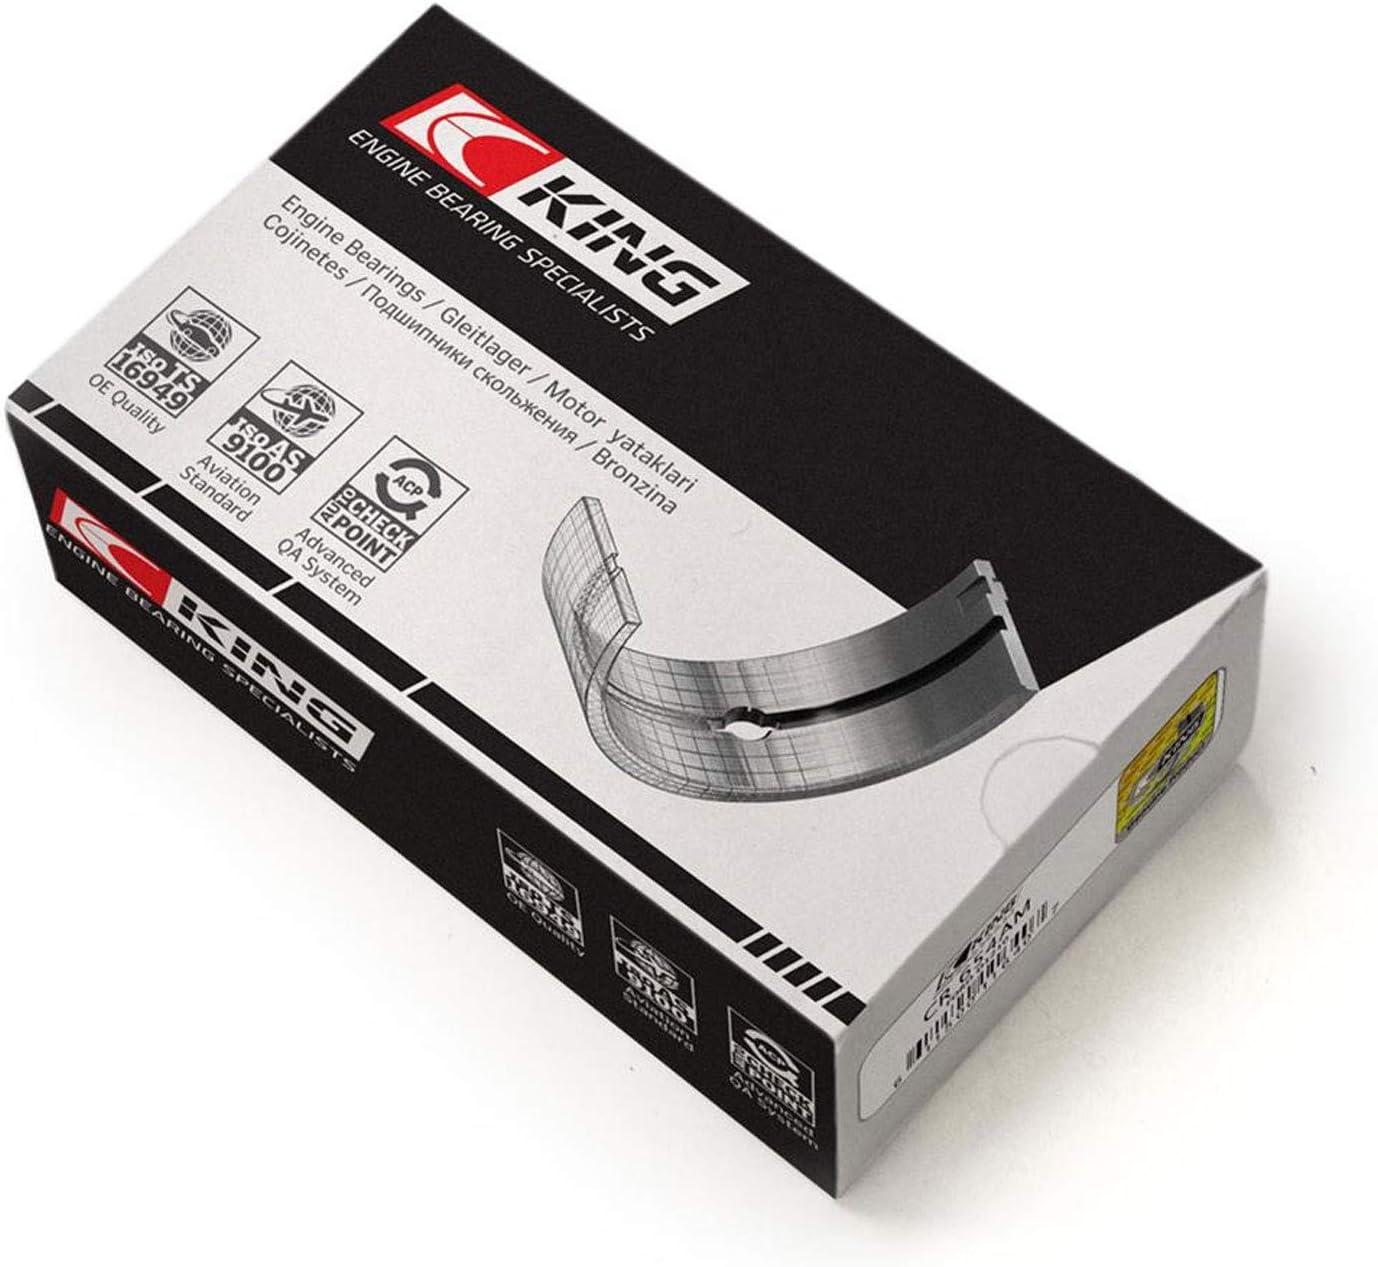 King Engine Bearings CS527BB Max 82% OFF Cam Same day shipping Set Bearing